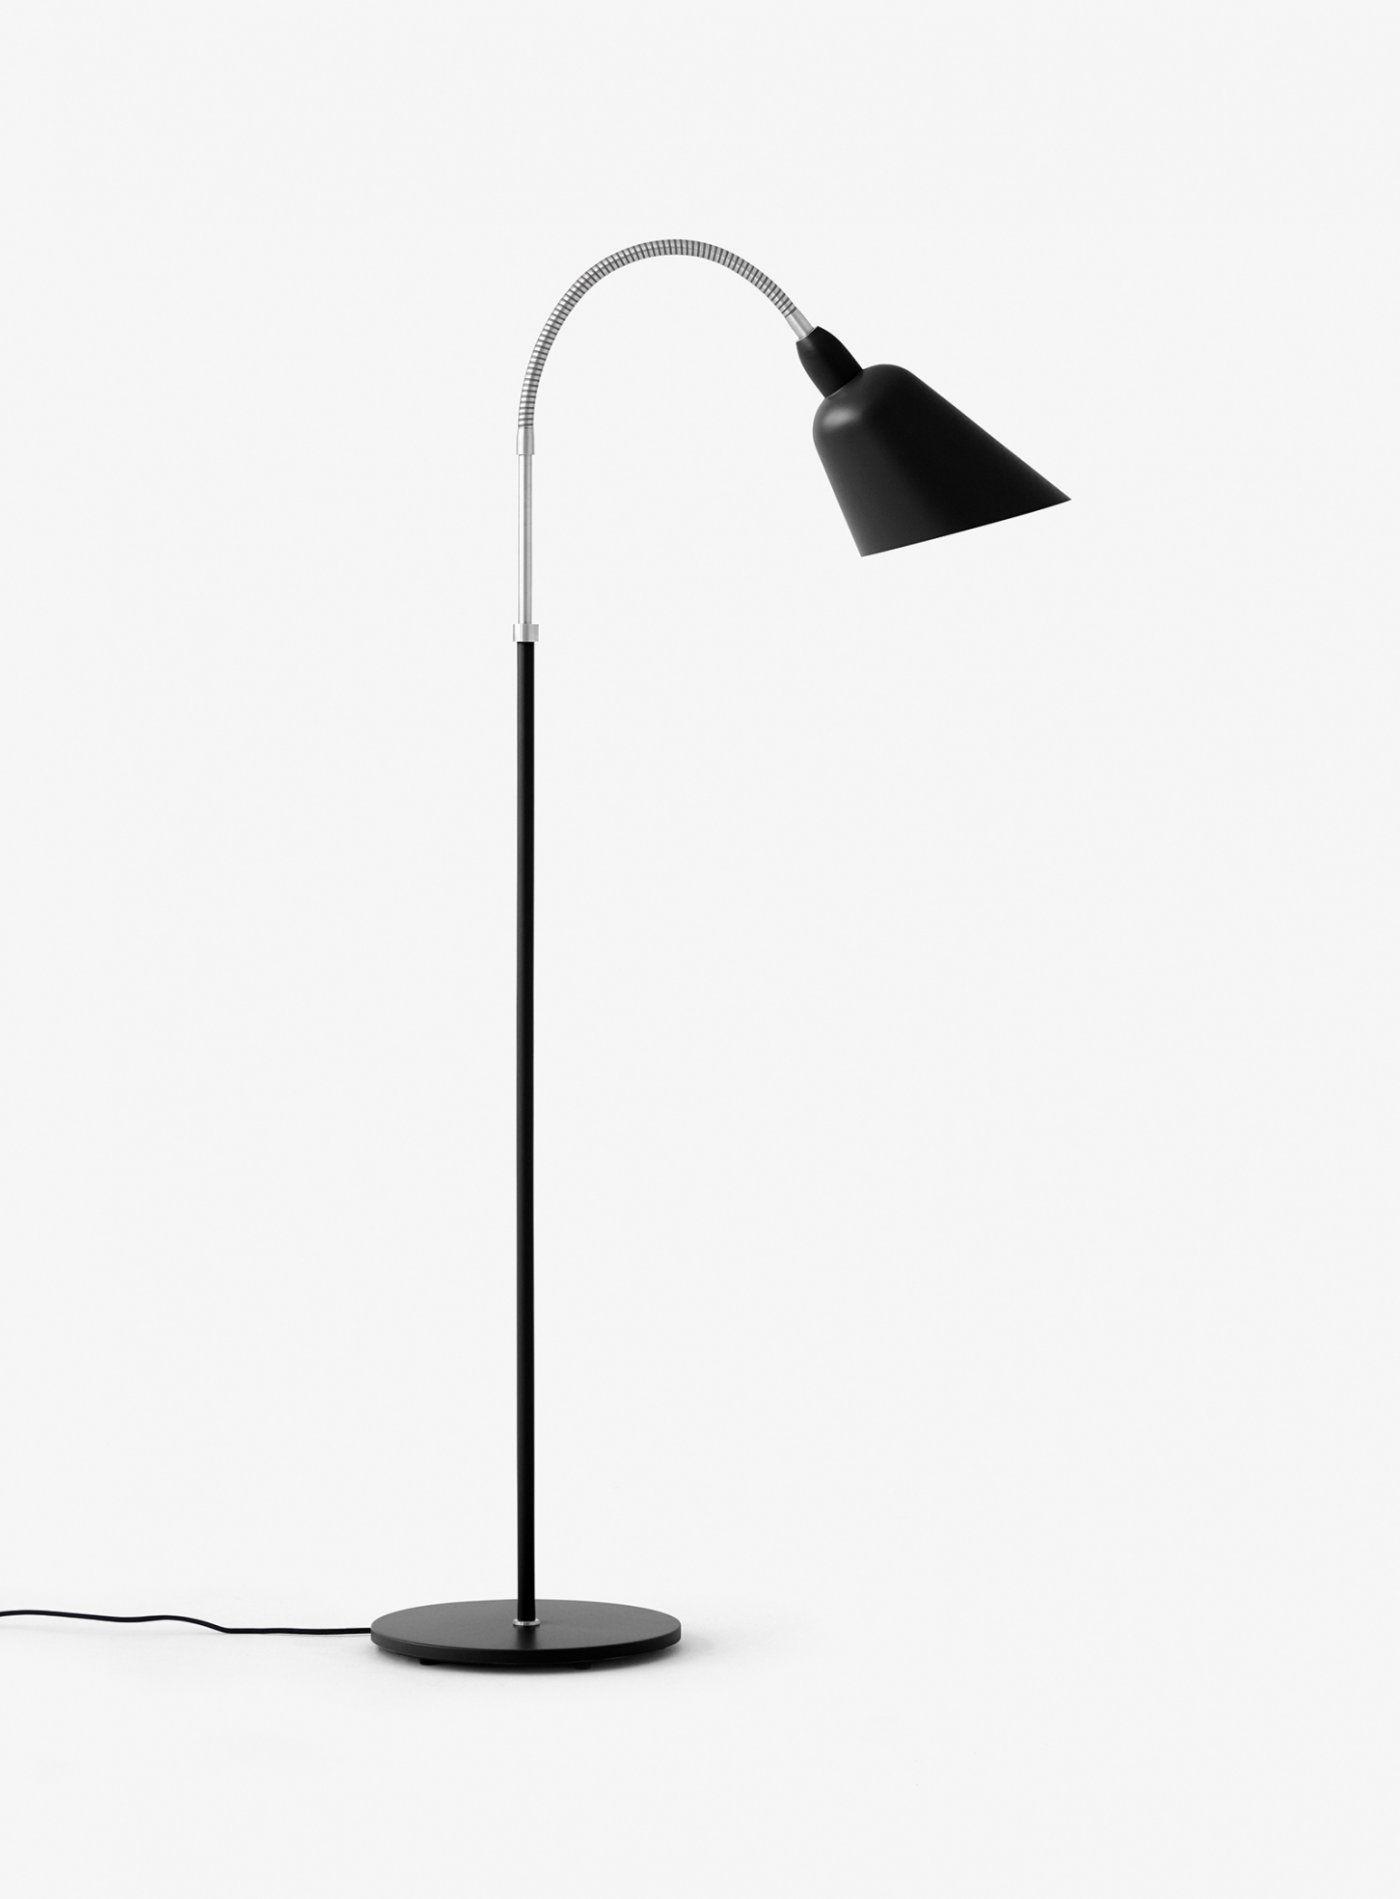 Tradition Bellevue Floor Lamp Aj7 Lamp Floor Lamp Table Lamp